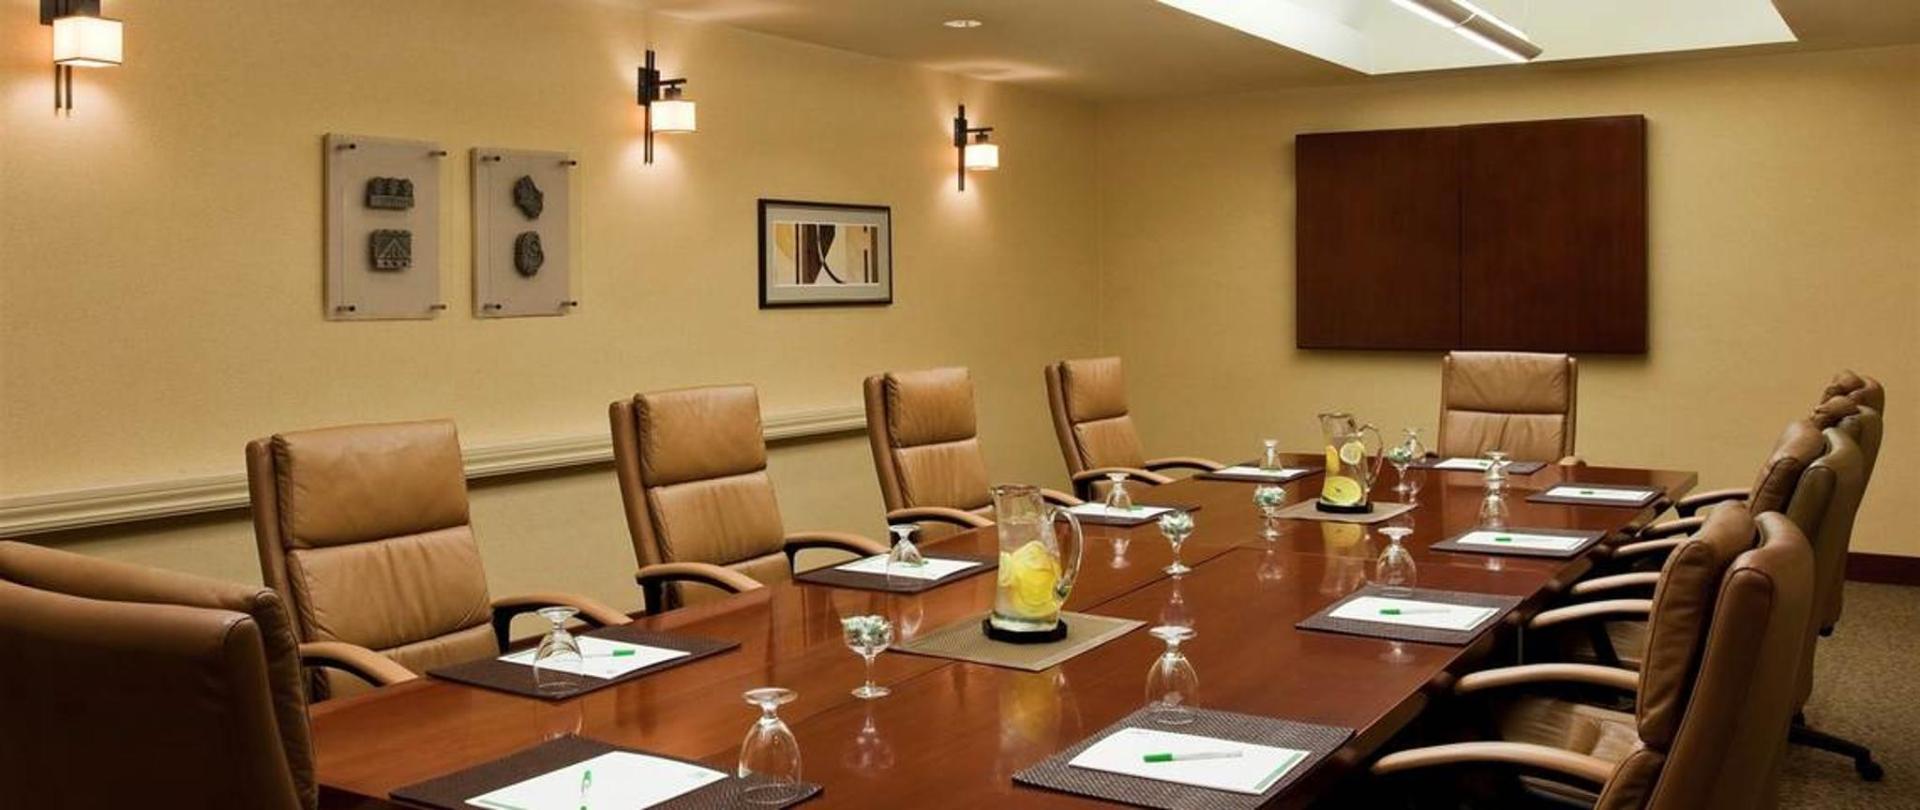 boardroom-1.jpg.1140x481_default.jpg